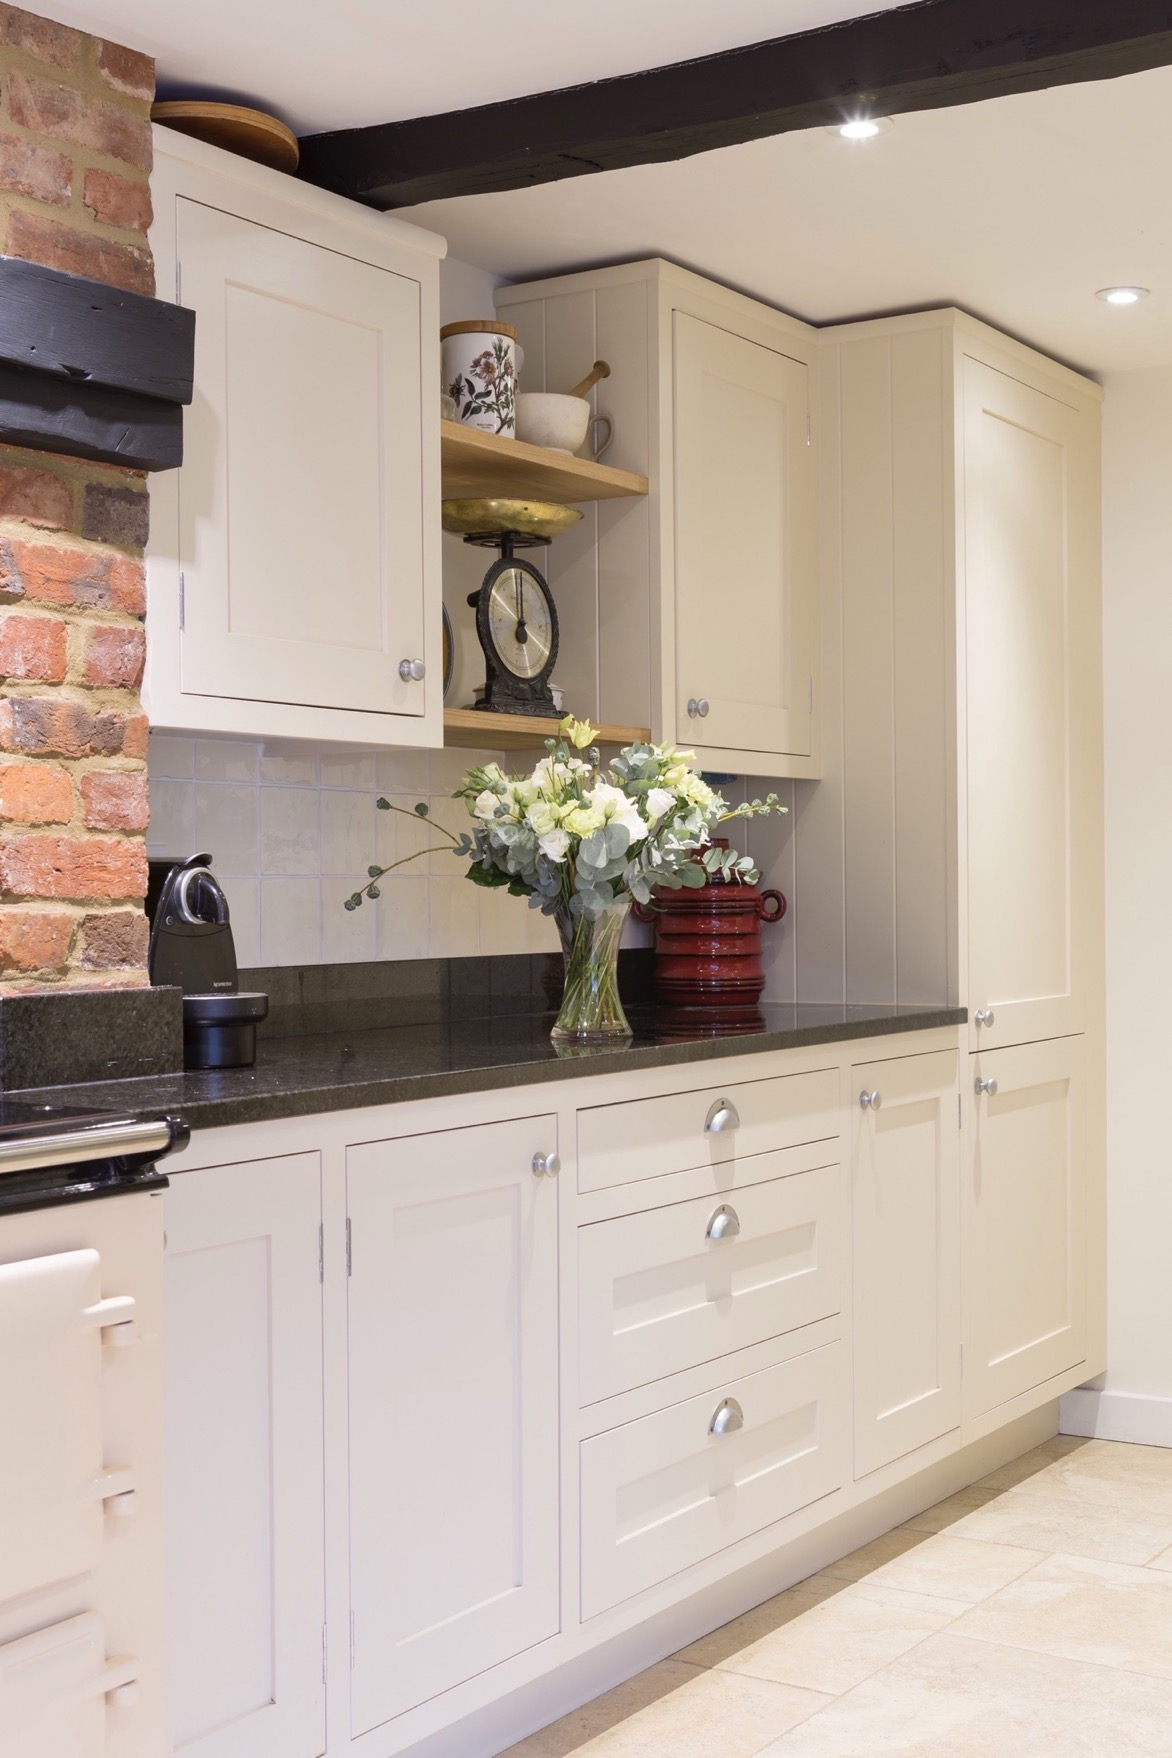 Handpainted kitchen with oak shelves and drawers amersham bucks 2 1